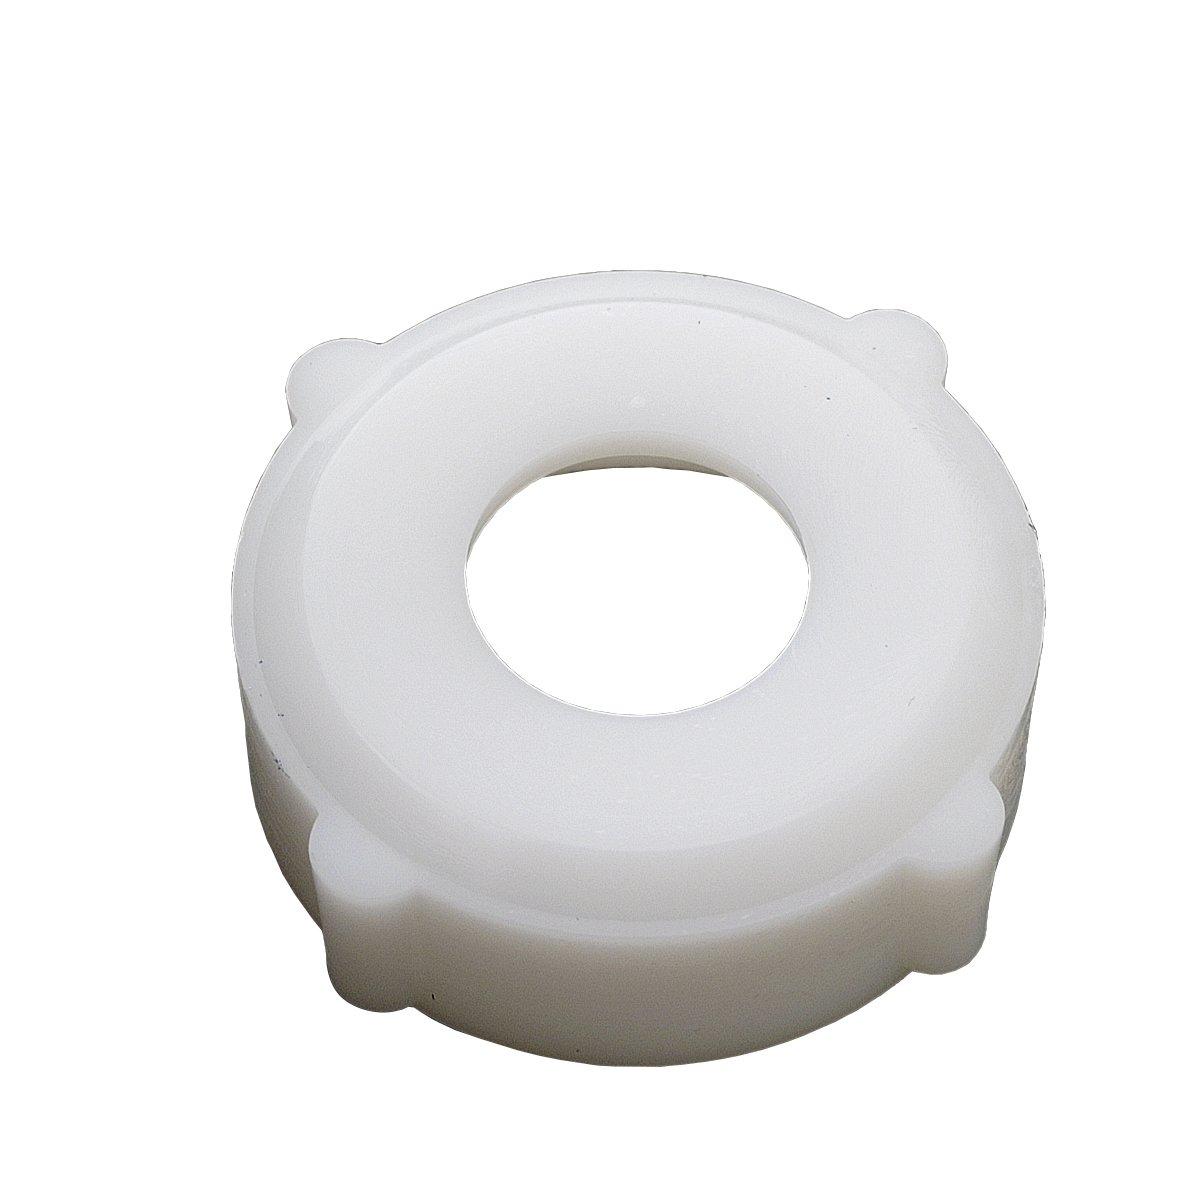 BrassCraft Mfg SF0833 Bathroom Pop-Up Nut for Price Pfister Faucets